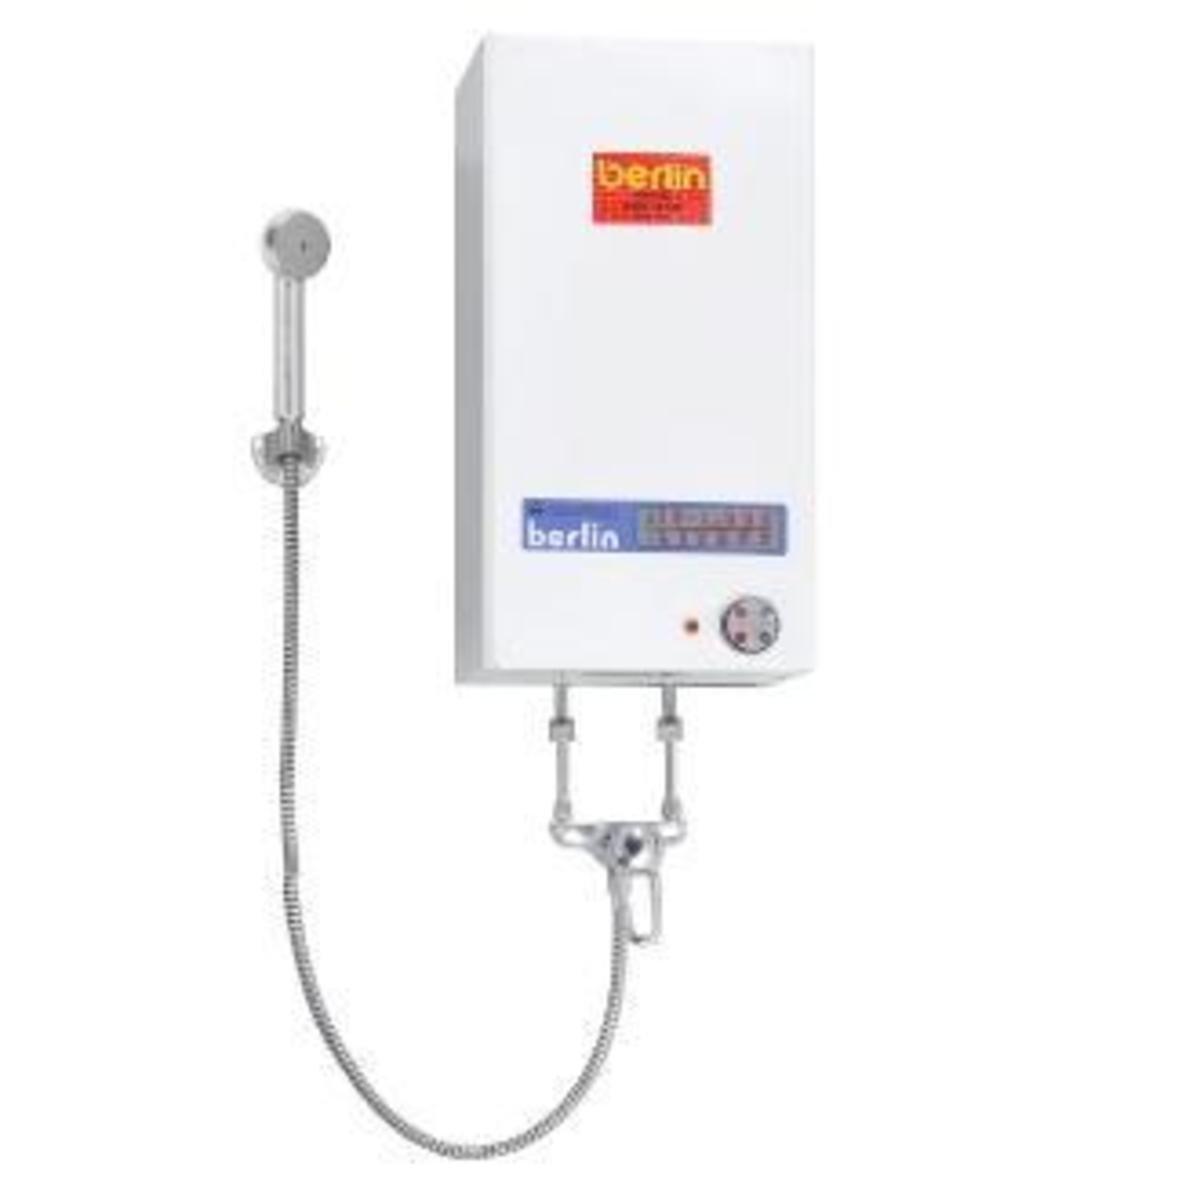 3kw 20公升花灑儲水式電熱水爐 NPF503L (原價$2300, 特價$1790)